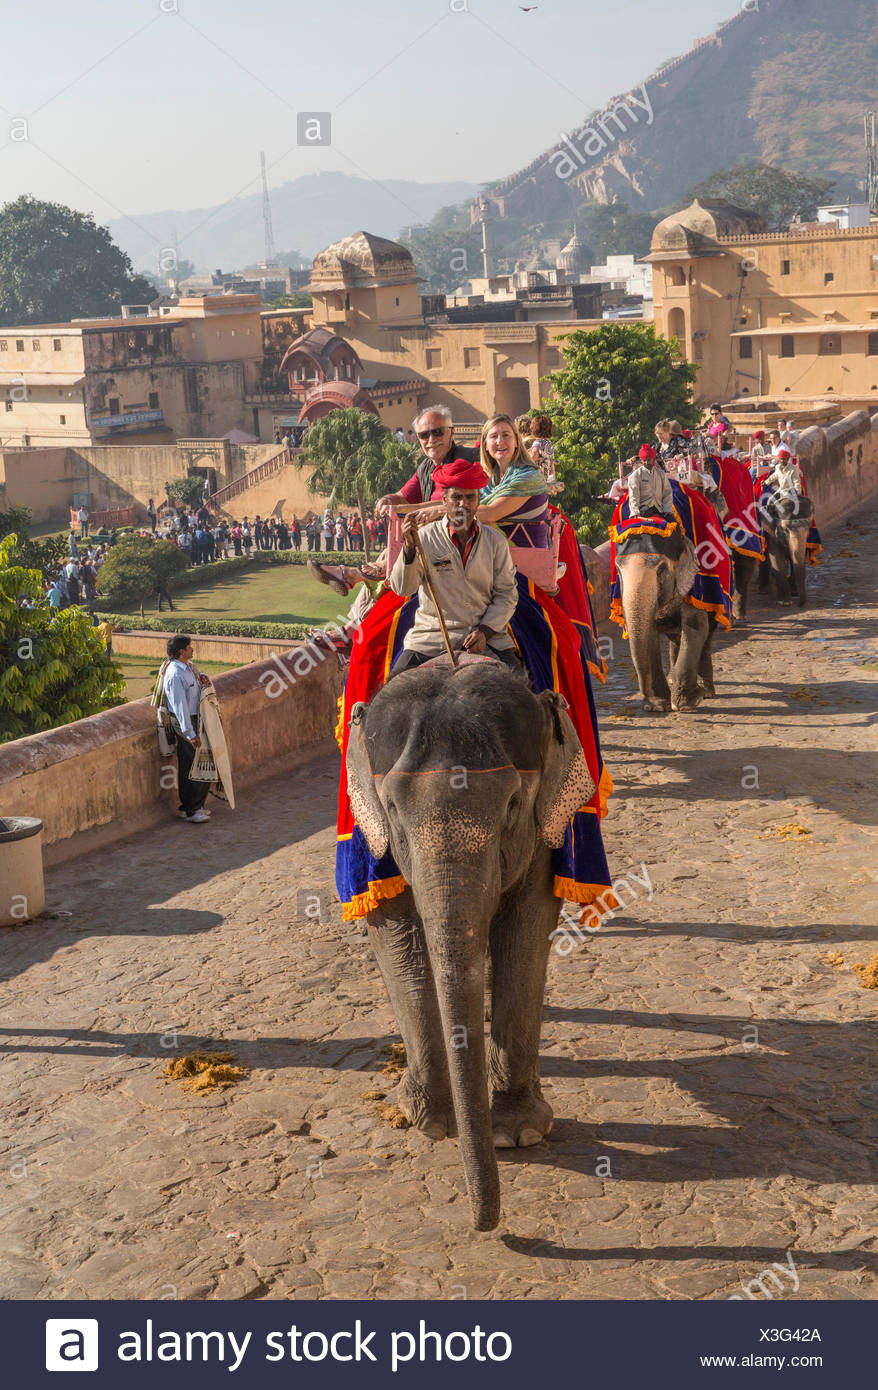 Los turistas, ride, Fort, ámbar, elefante, Asia, India, elefantes, Rajasthan, Jaipur, ámbar Imagen De Stock